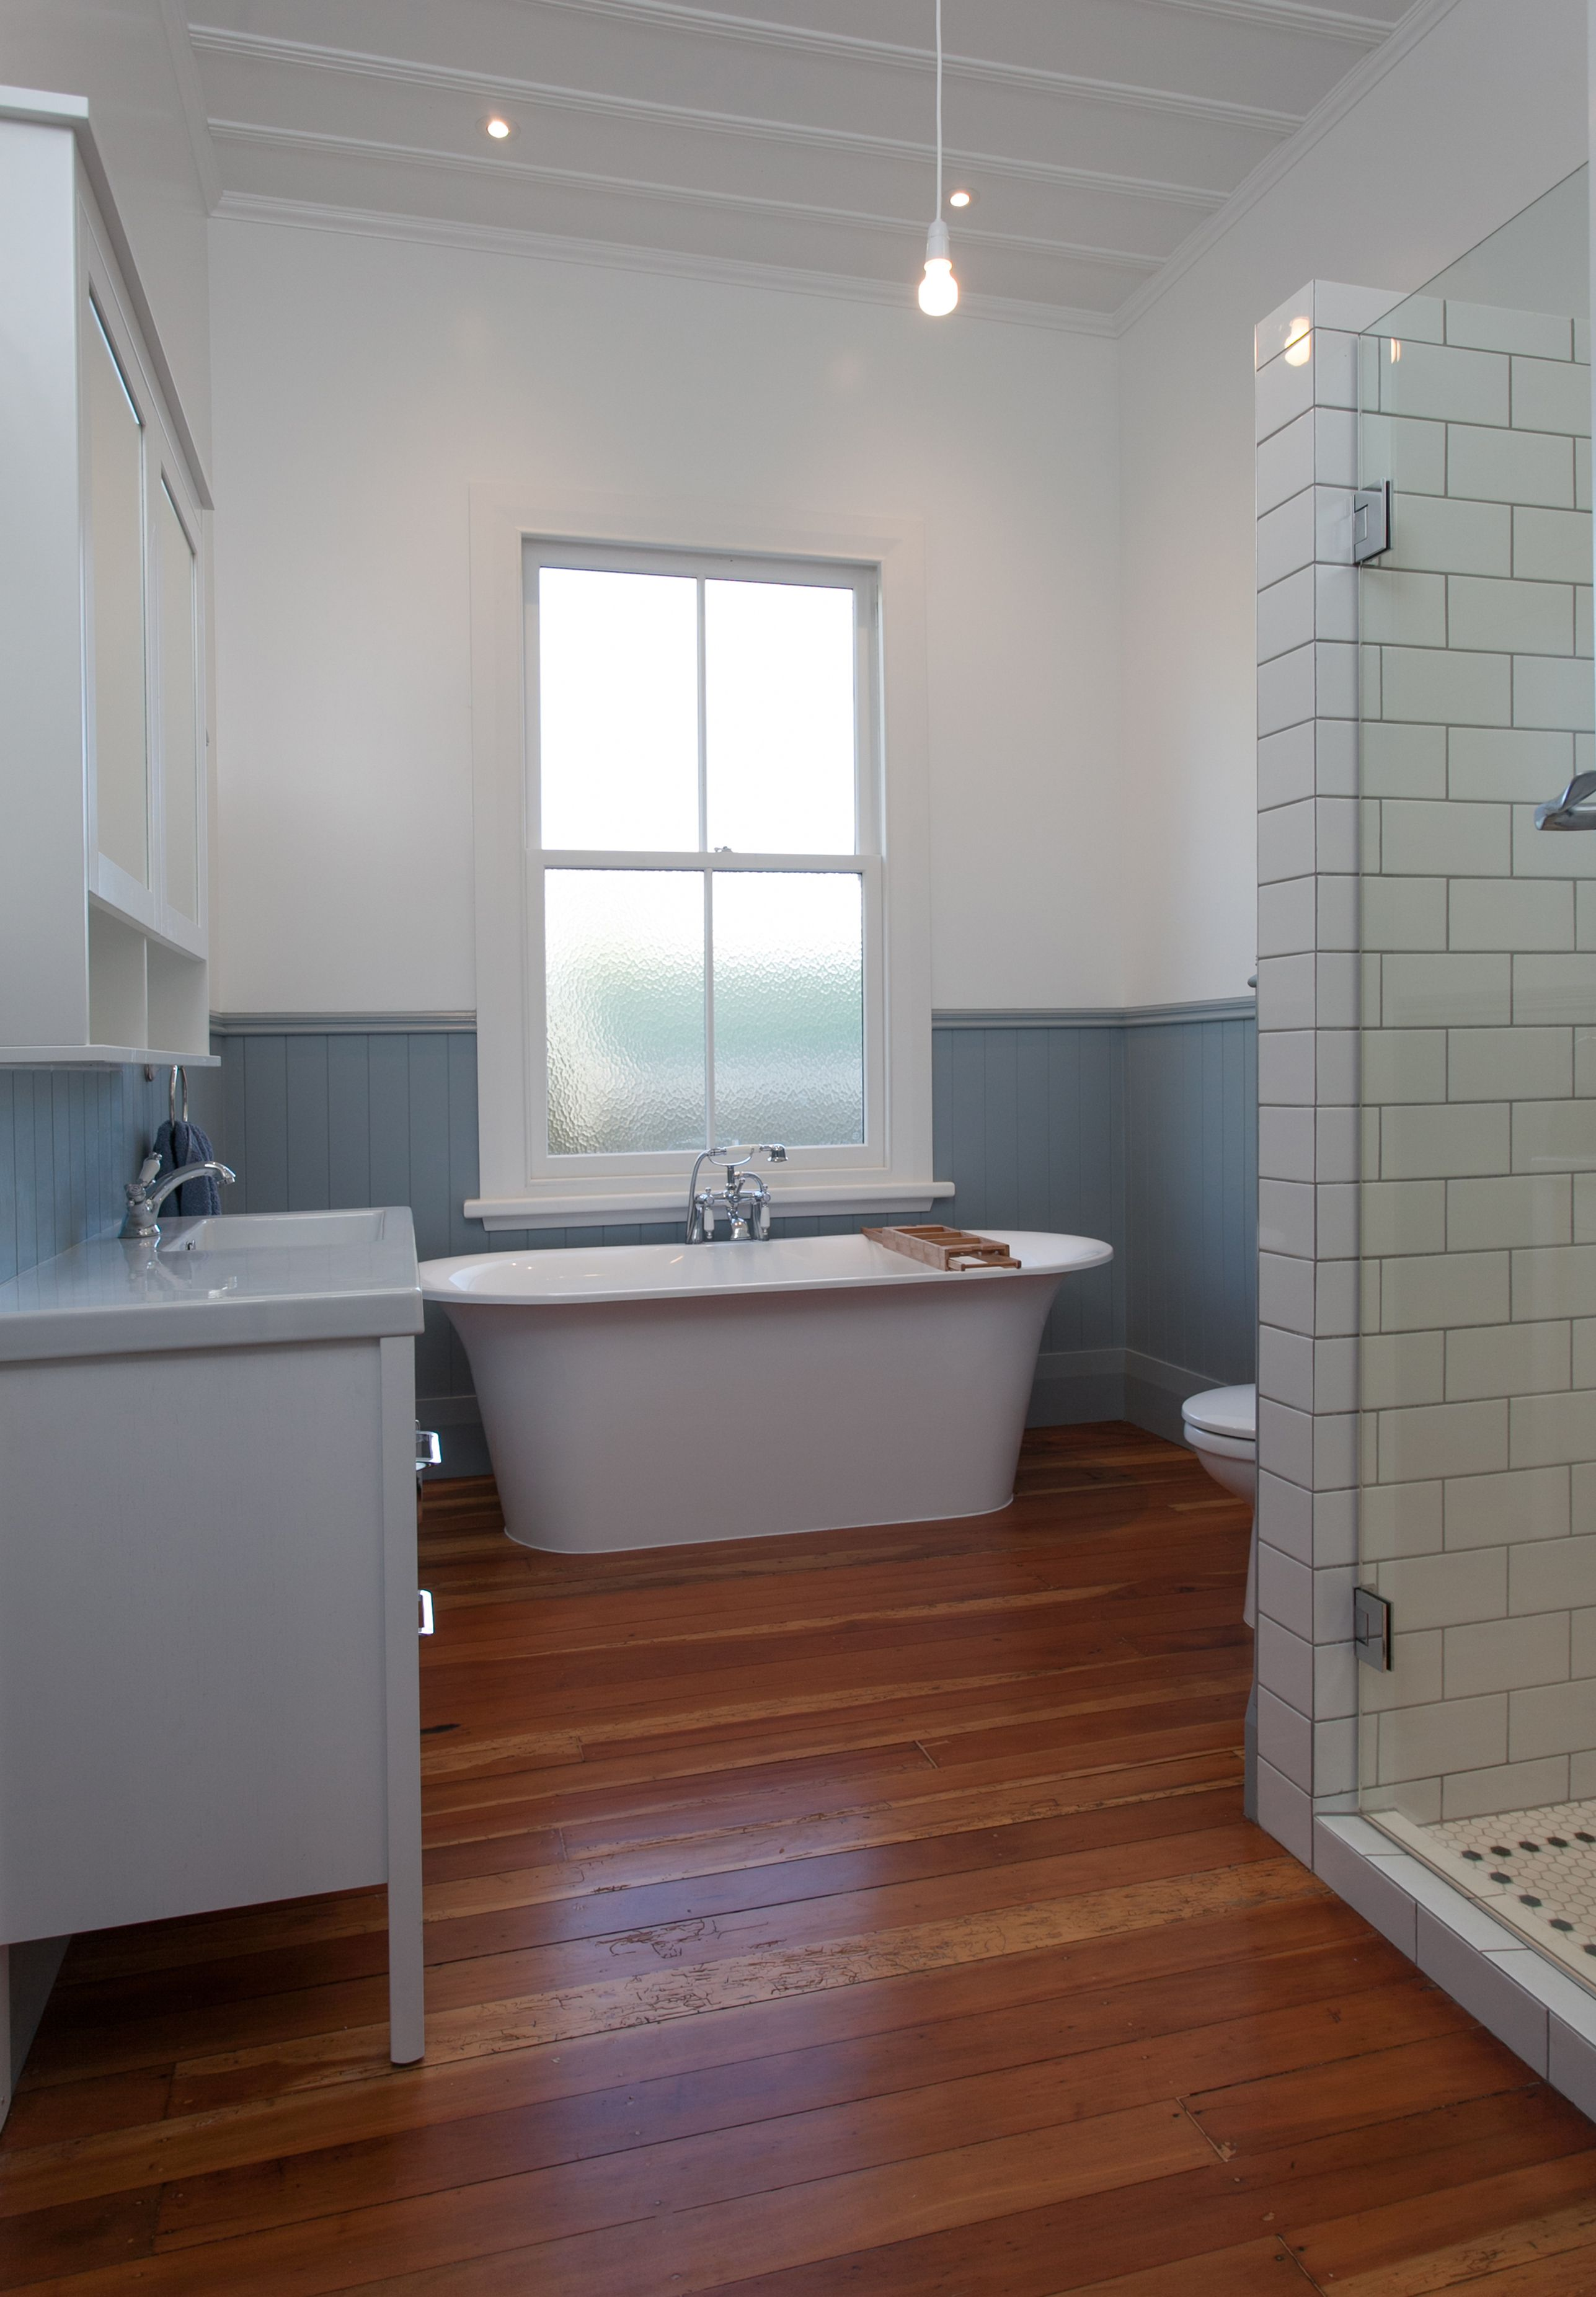 Exquisite Renovated Bathrooms Of Bathroom To S Villa Cambridge New